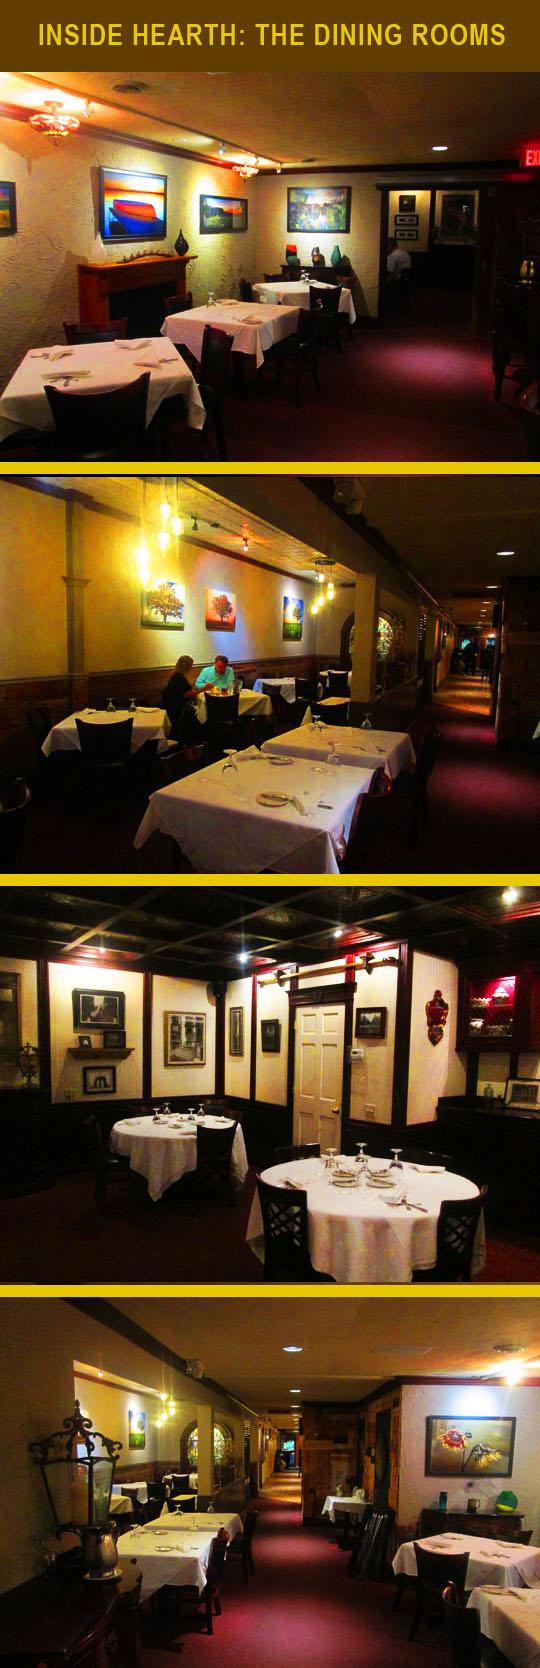 4. diningrooms_sept14-18.jpg